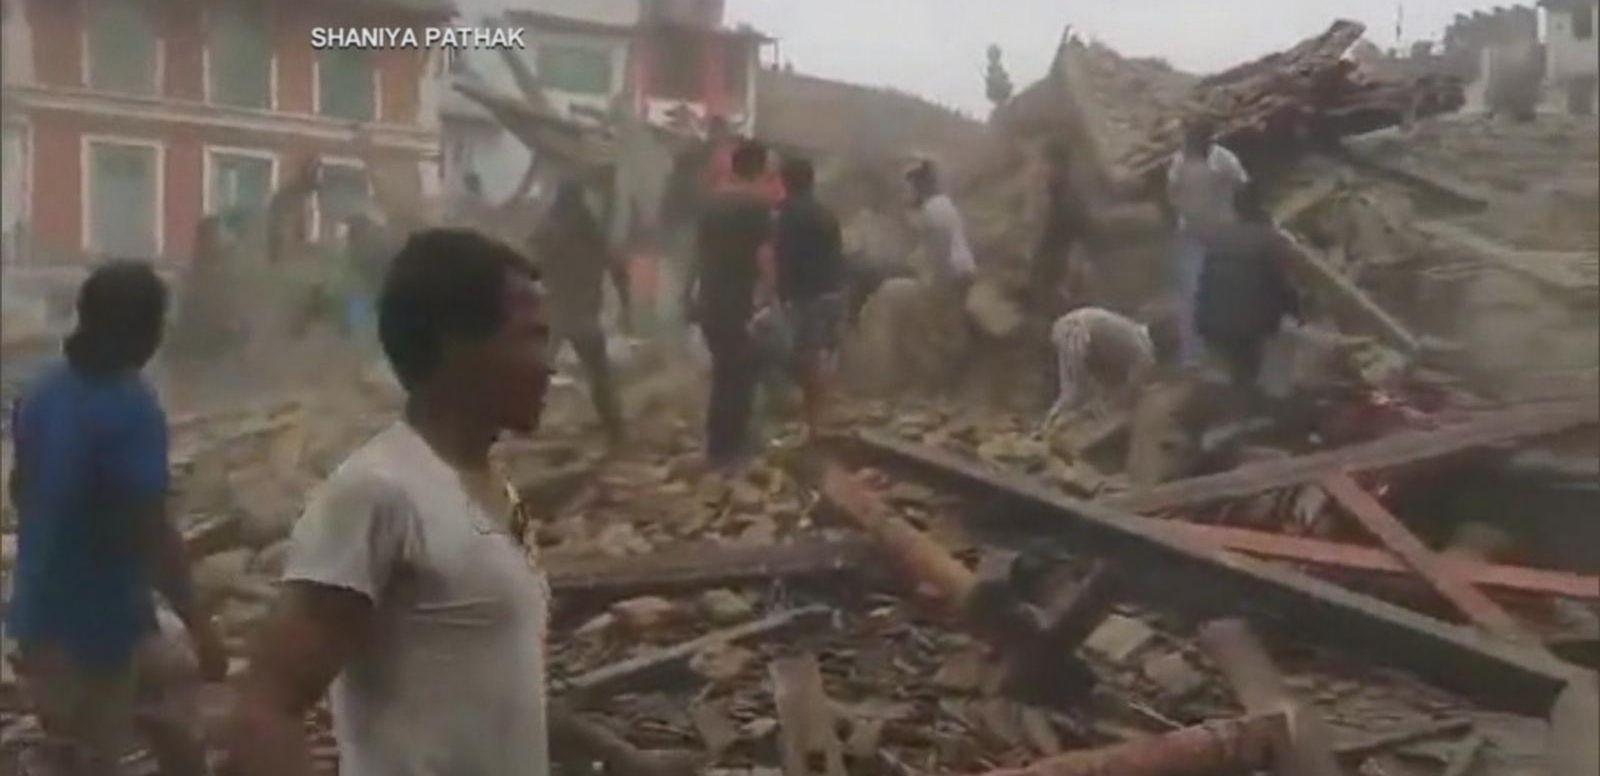 VIDEO: Earthquake in Nepal Leaves Hundreds Dead